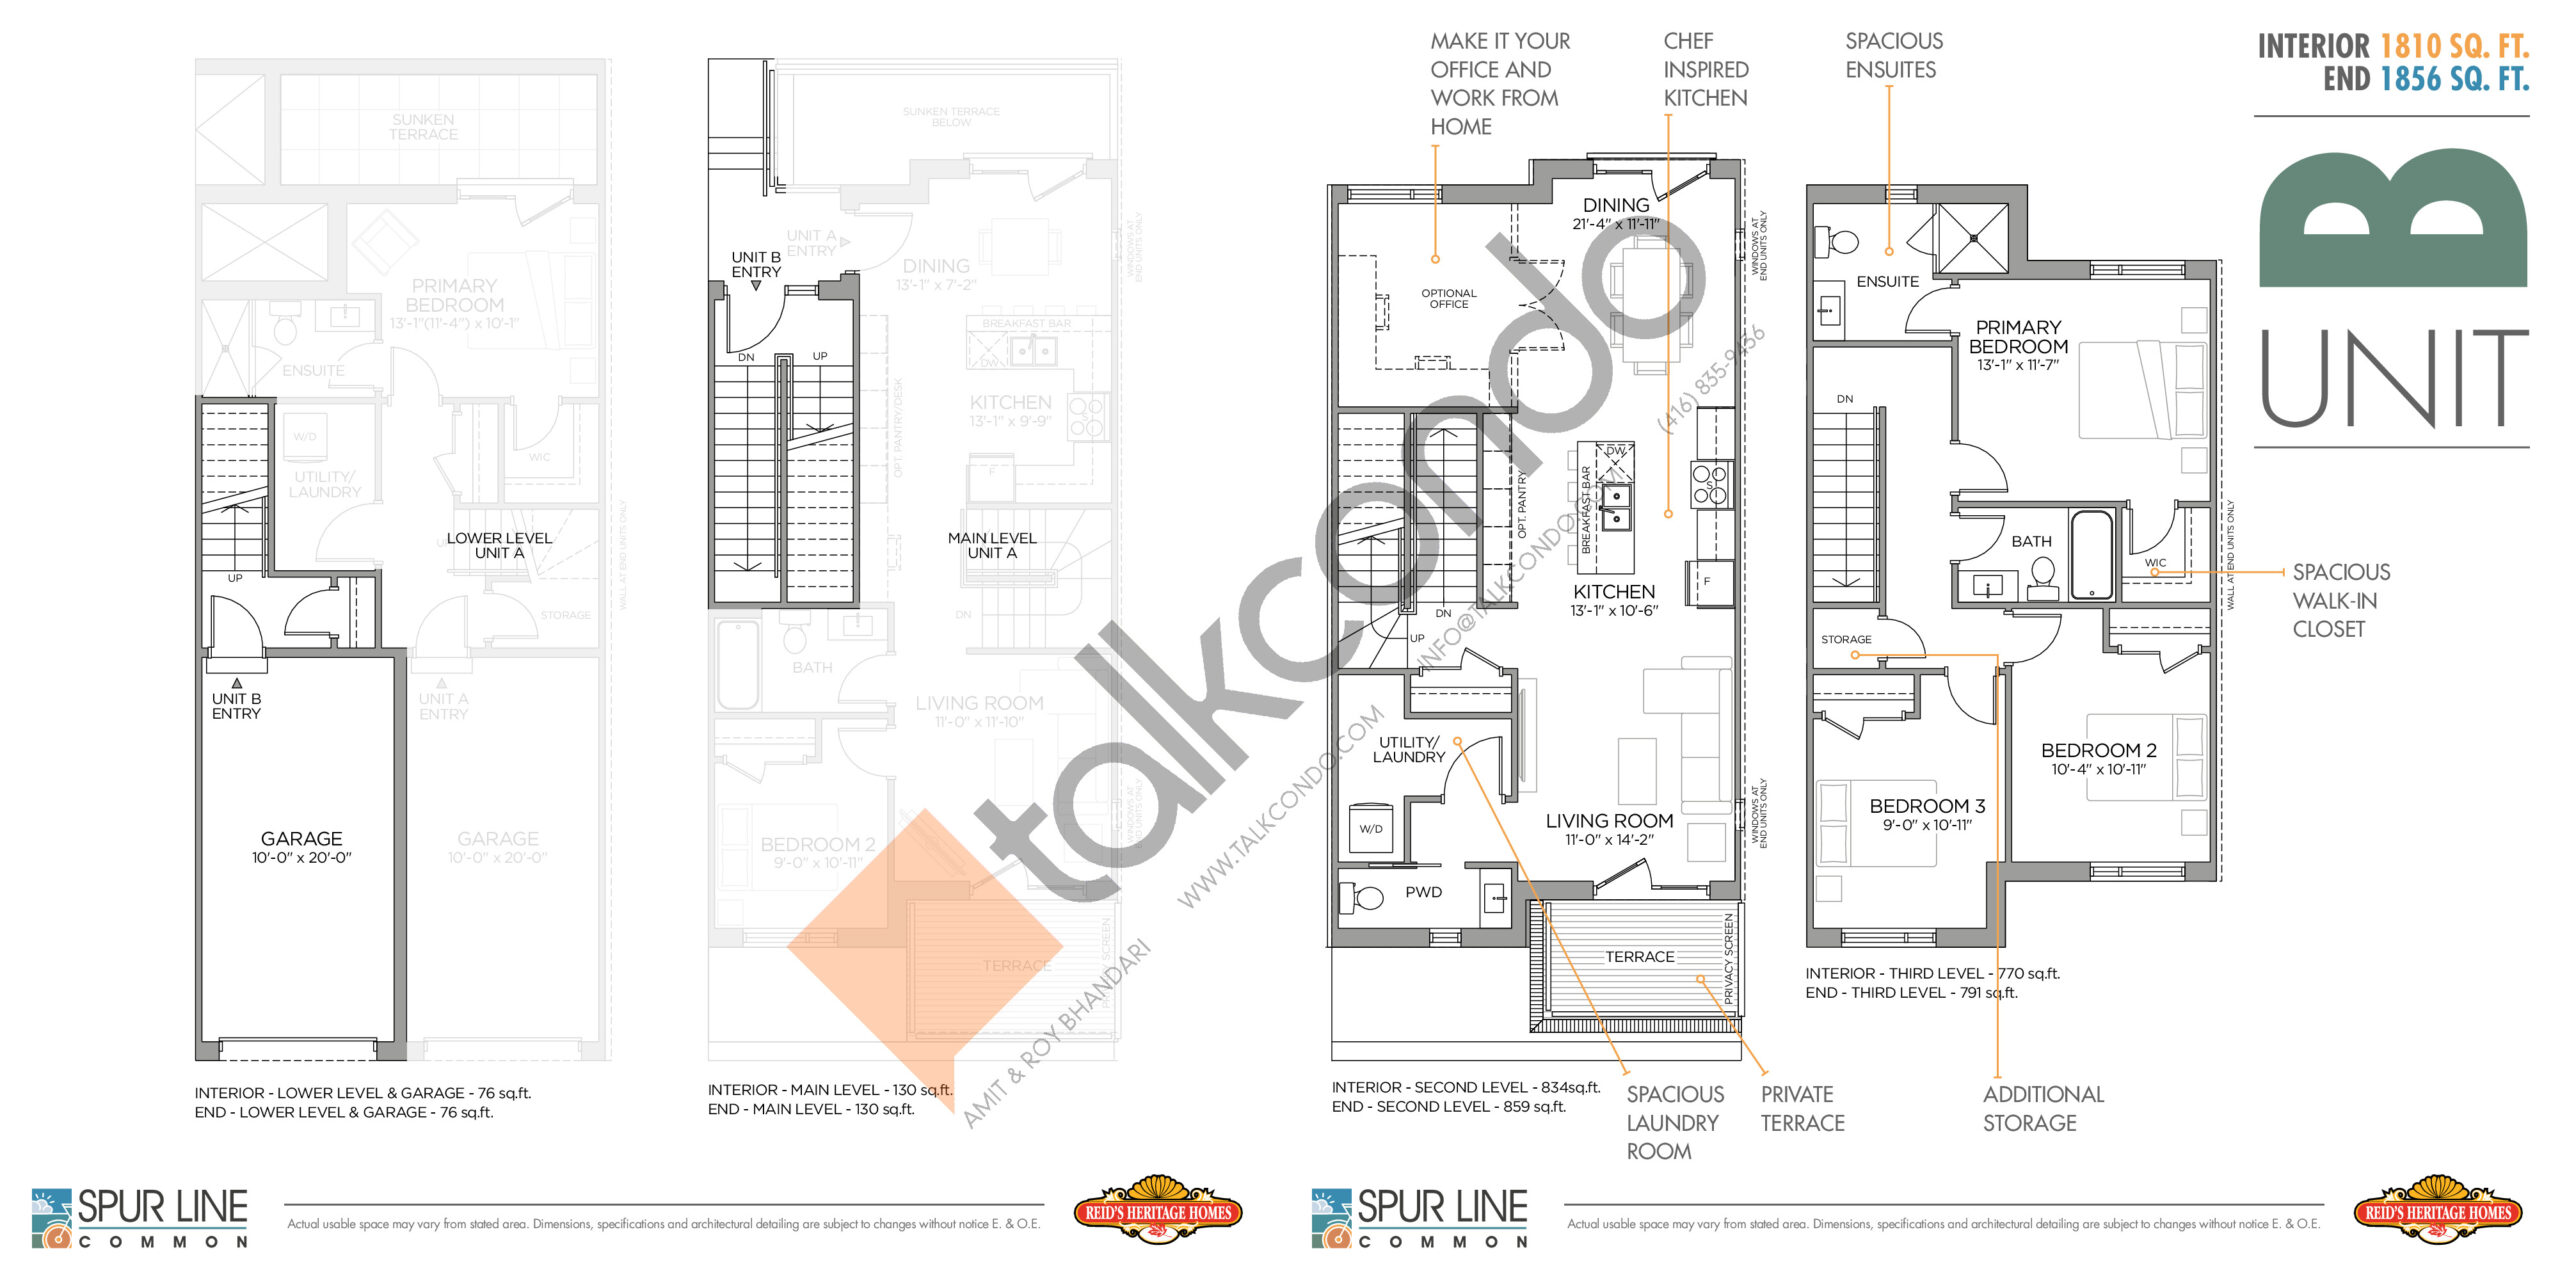 Unit B Floor Plan at Spur Line Common Towns - 1856 sq.ft